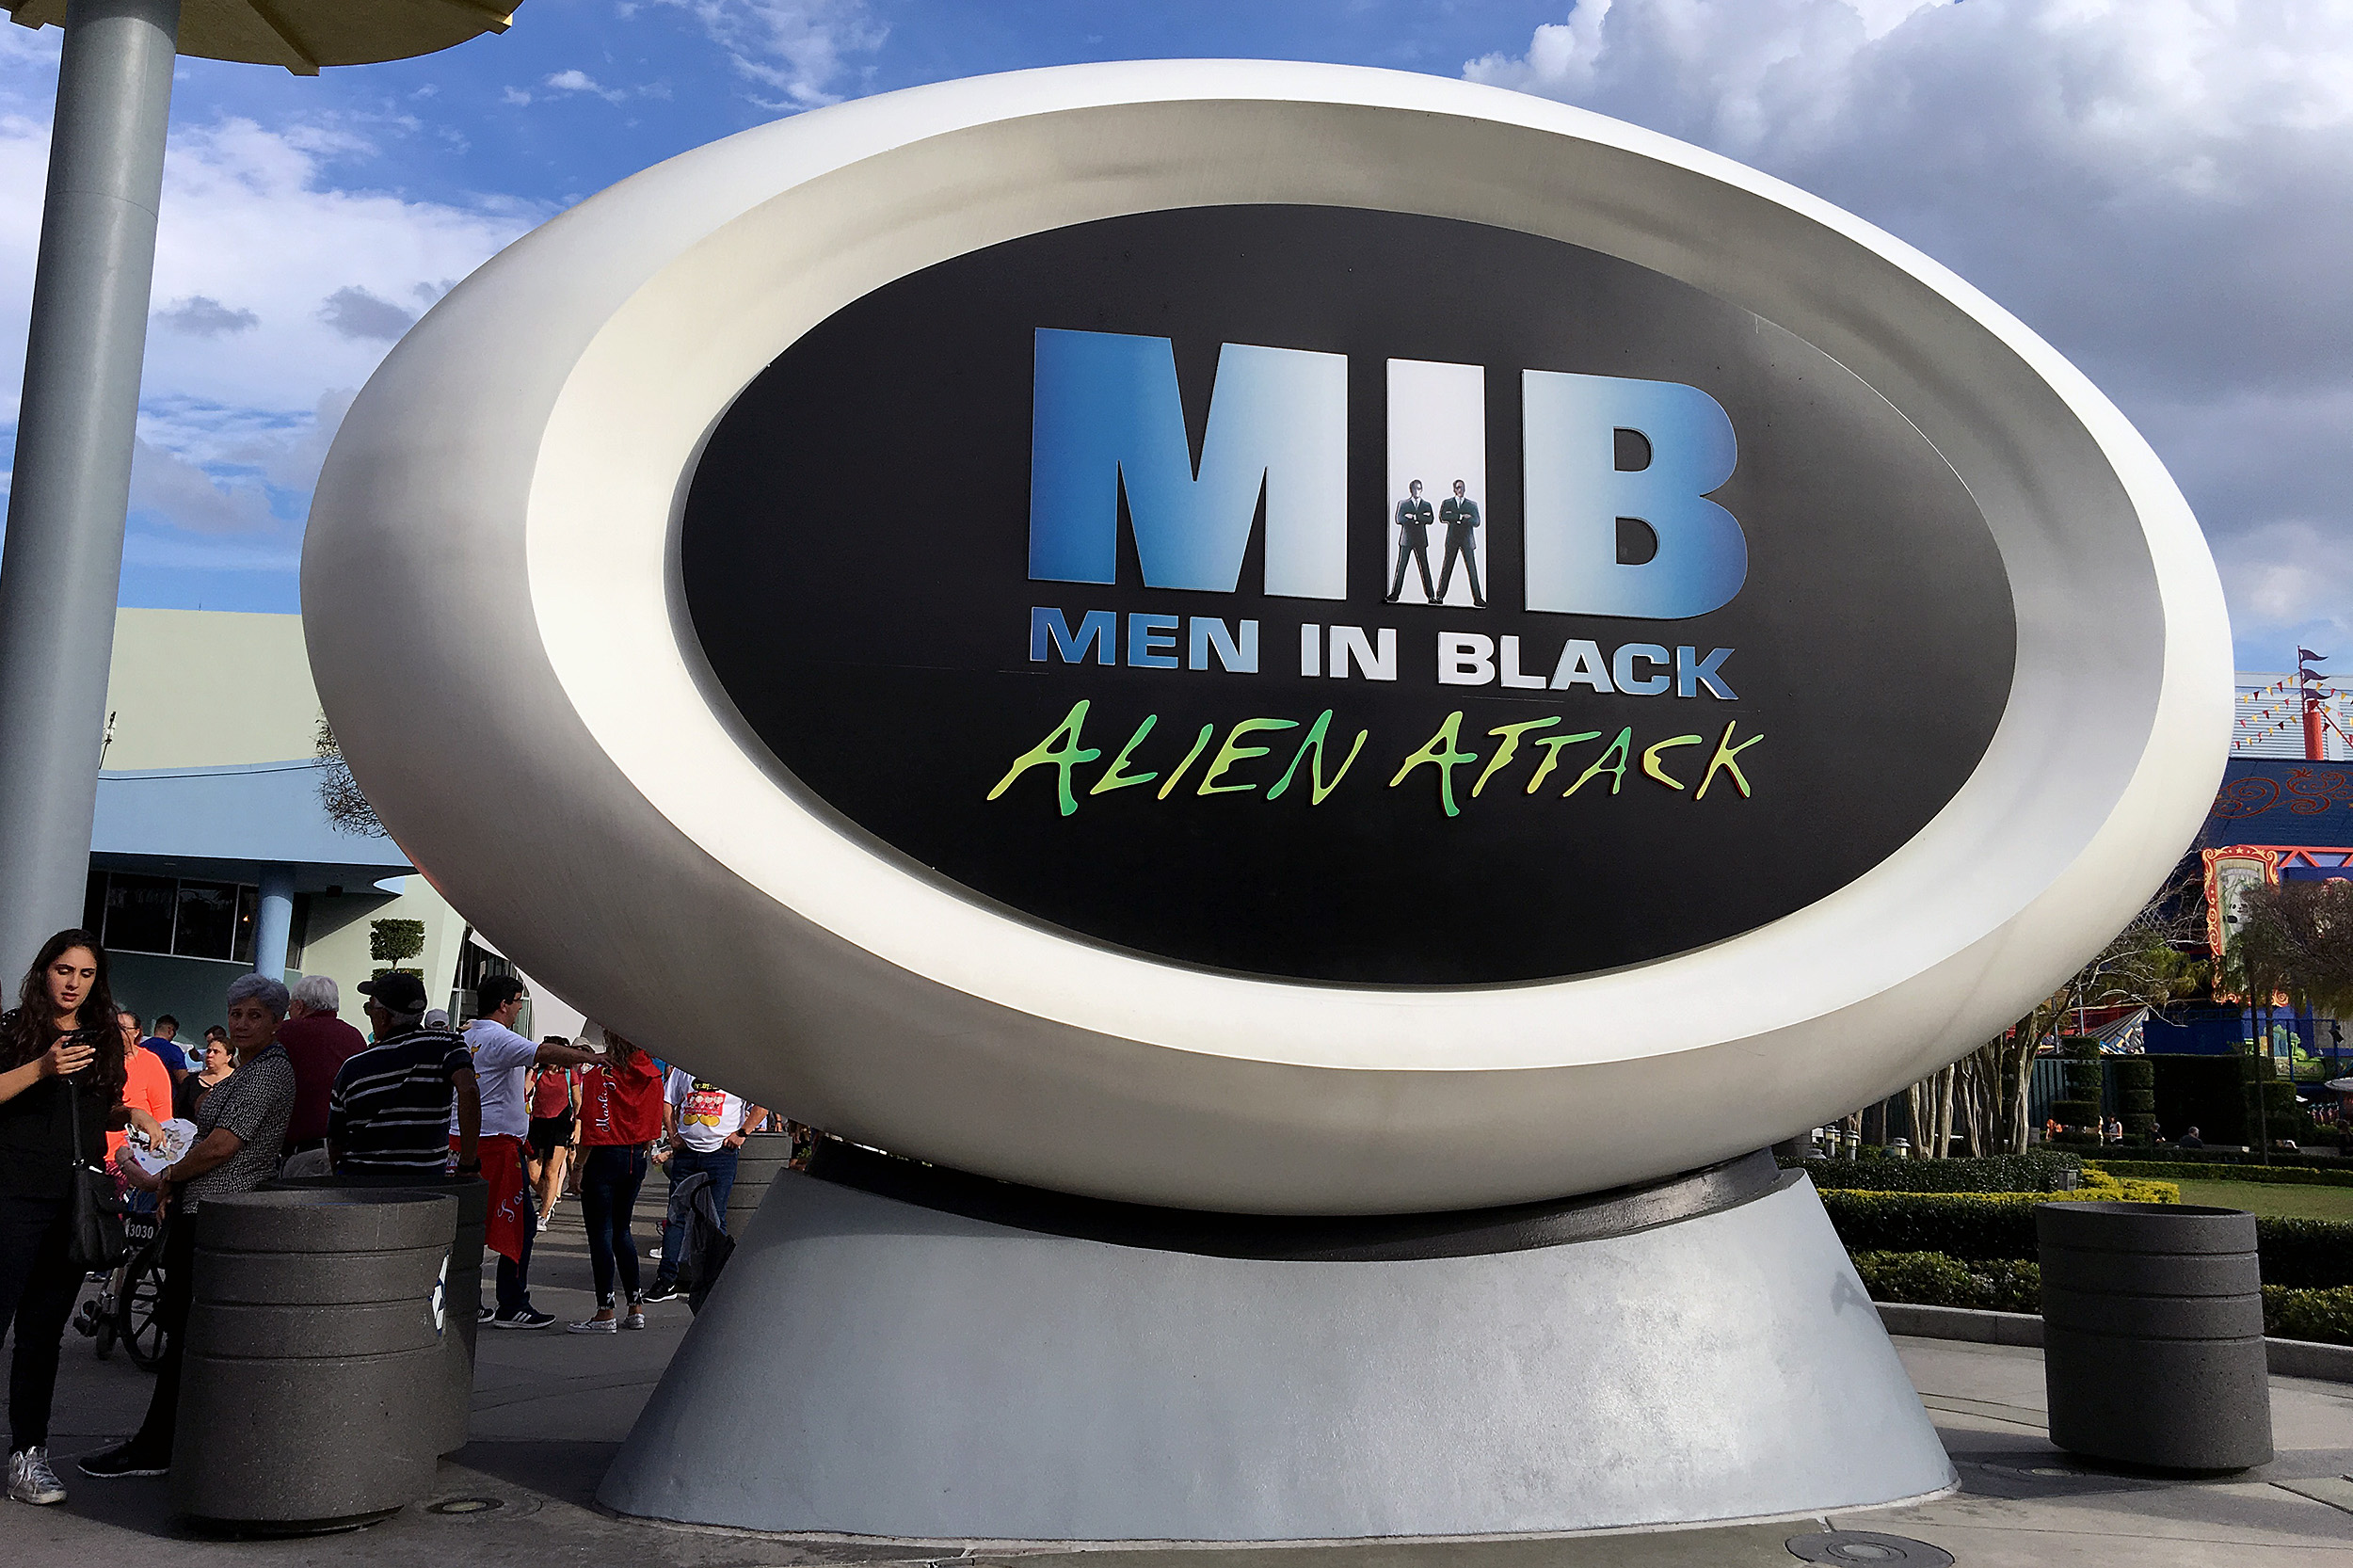 MEN IN BLACK Alien Attack Universal studios Florida